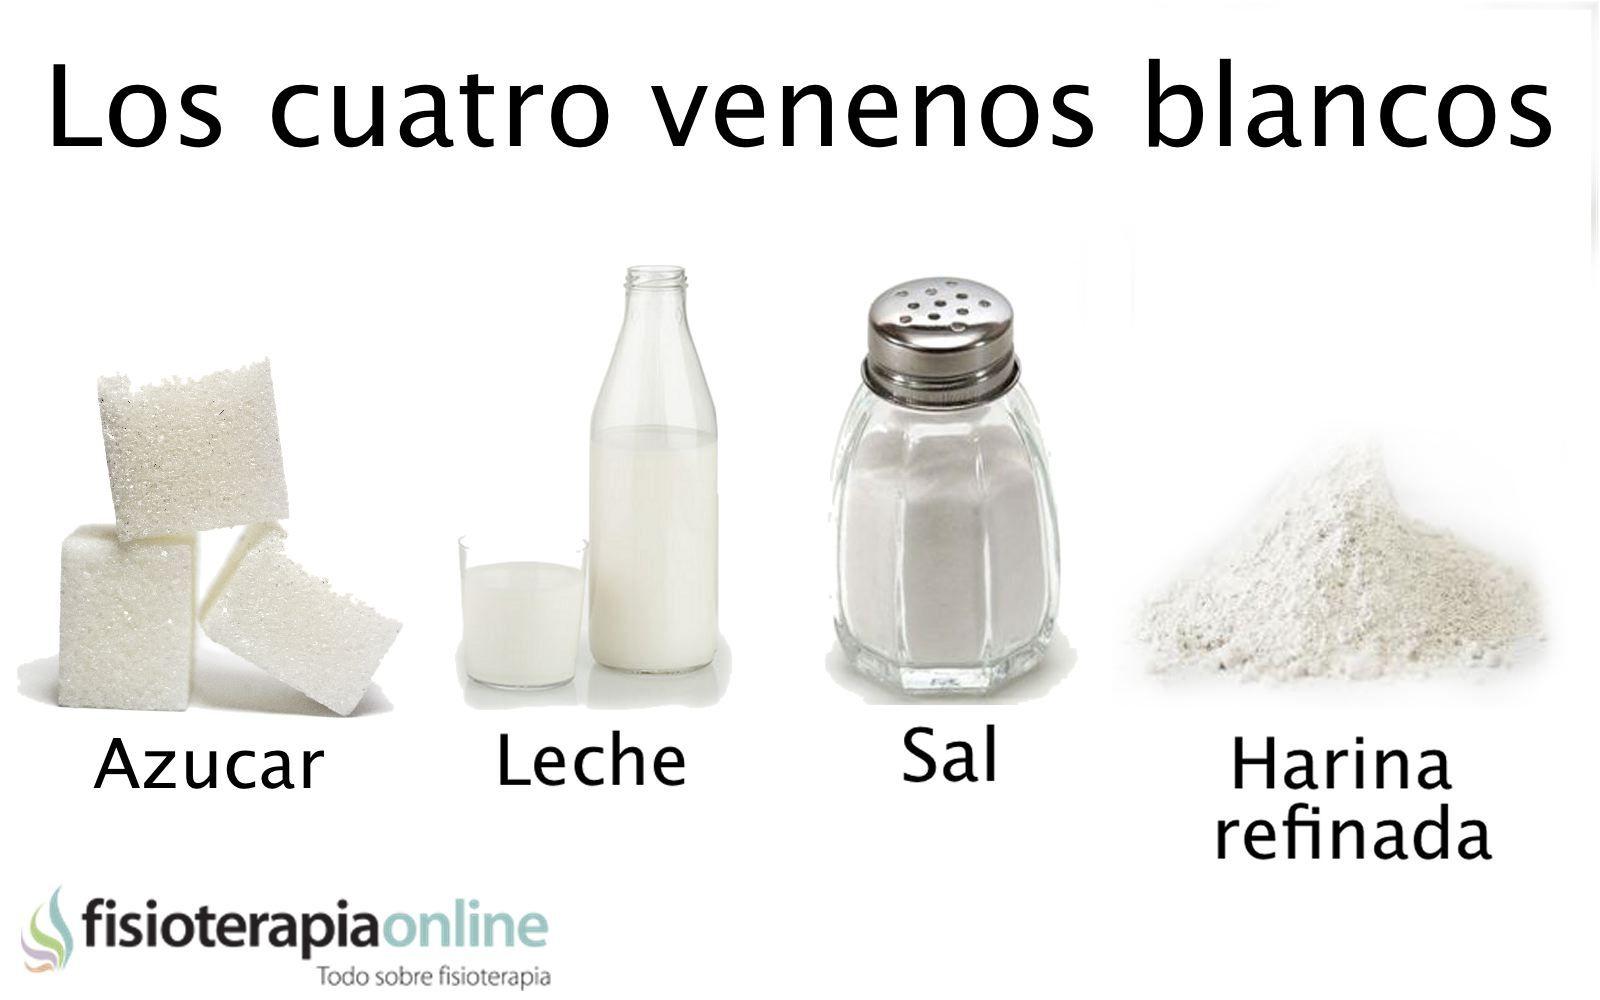 133-venenos blancos